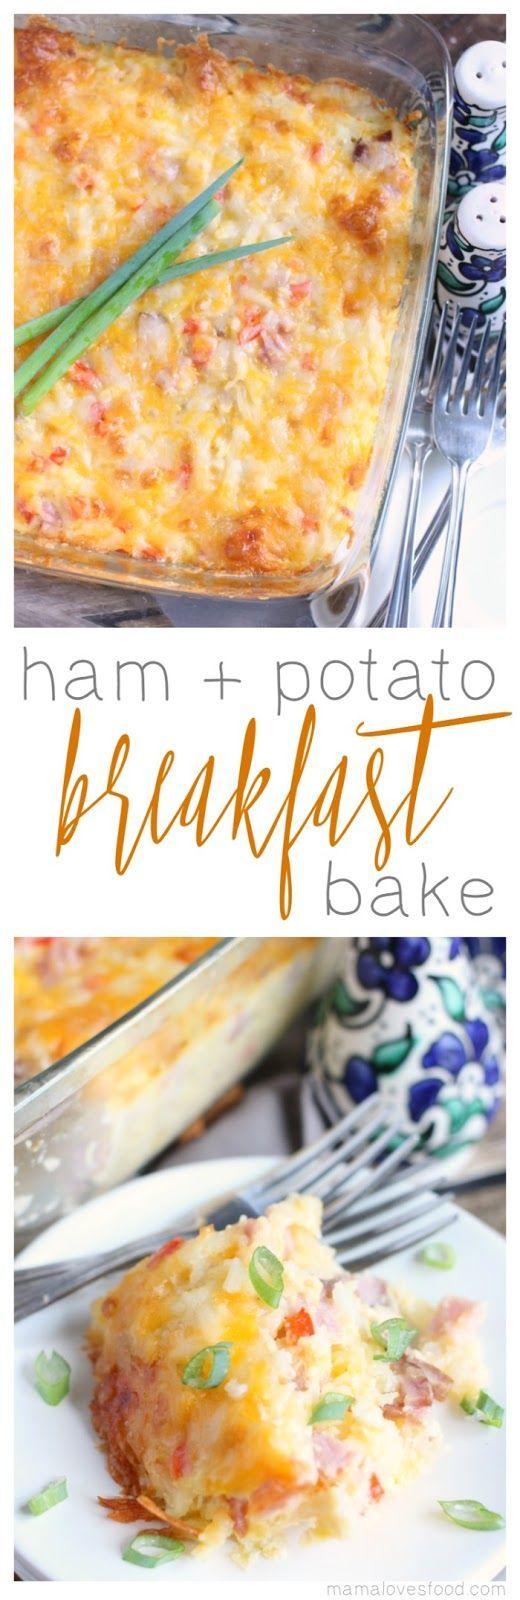 Breakfast Casserole Ham and Potato Breakfast Bake Recipe